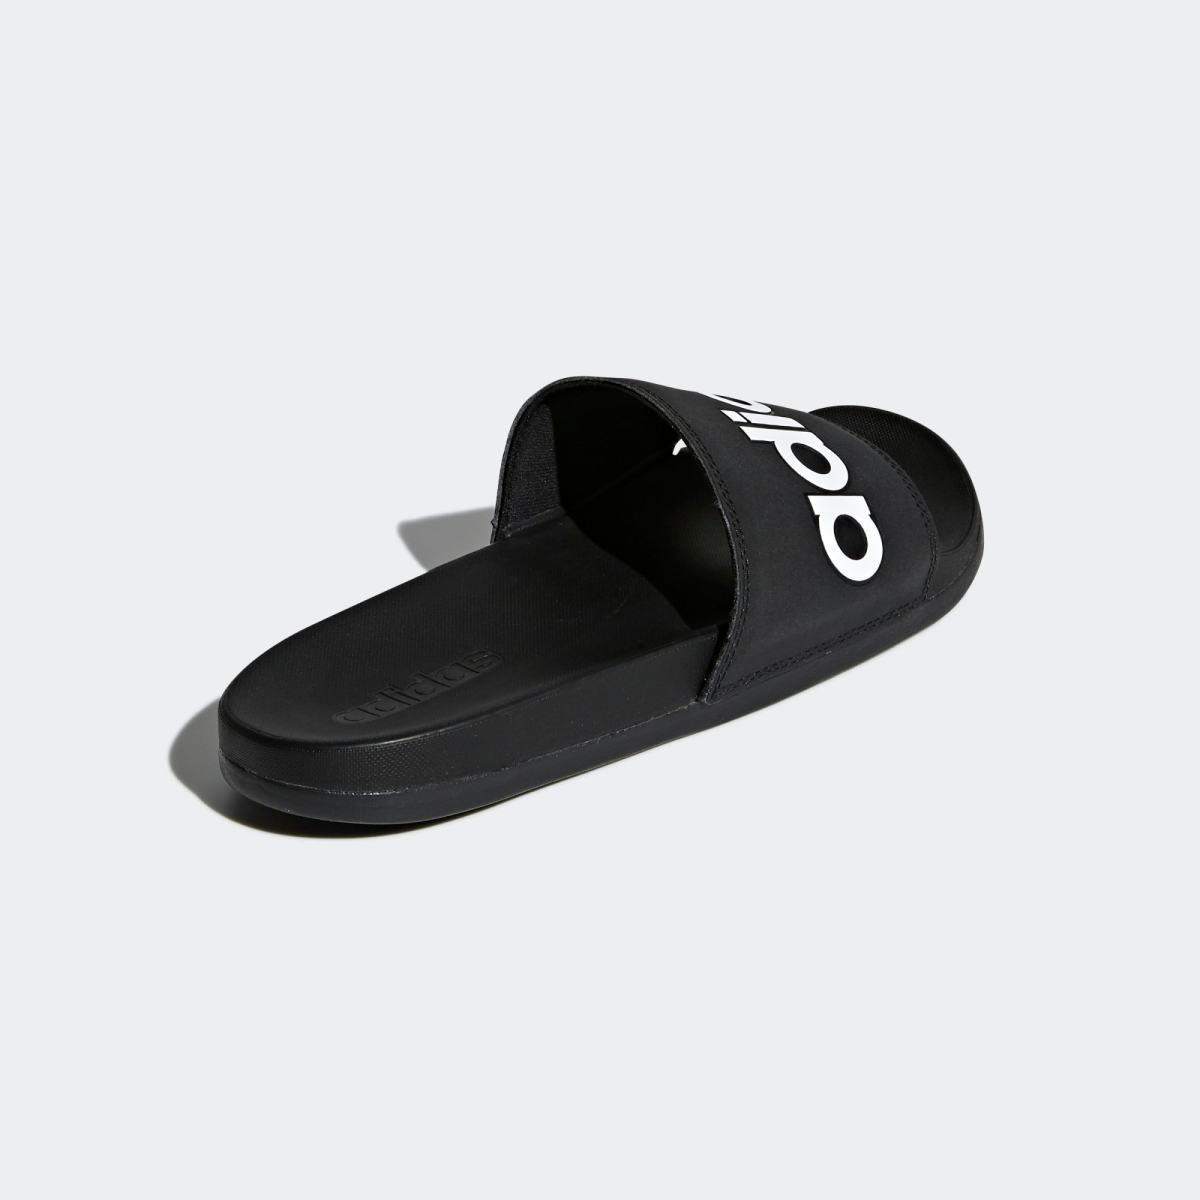 Adilette_Comfort_Slides_Black_B42207_05_standard